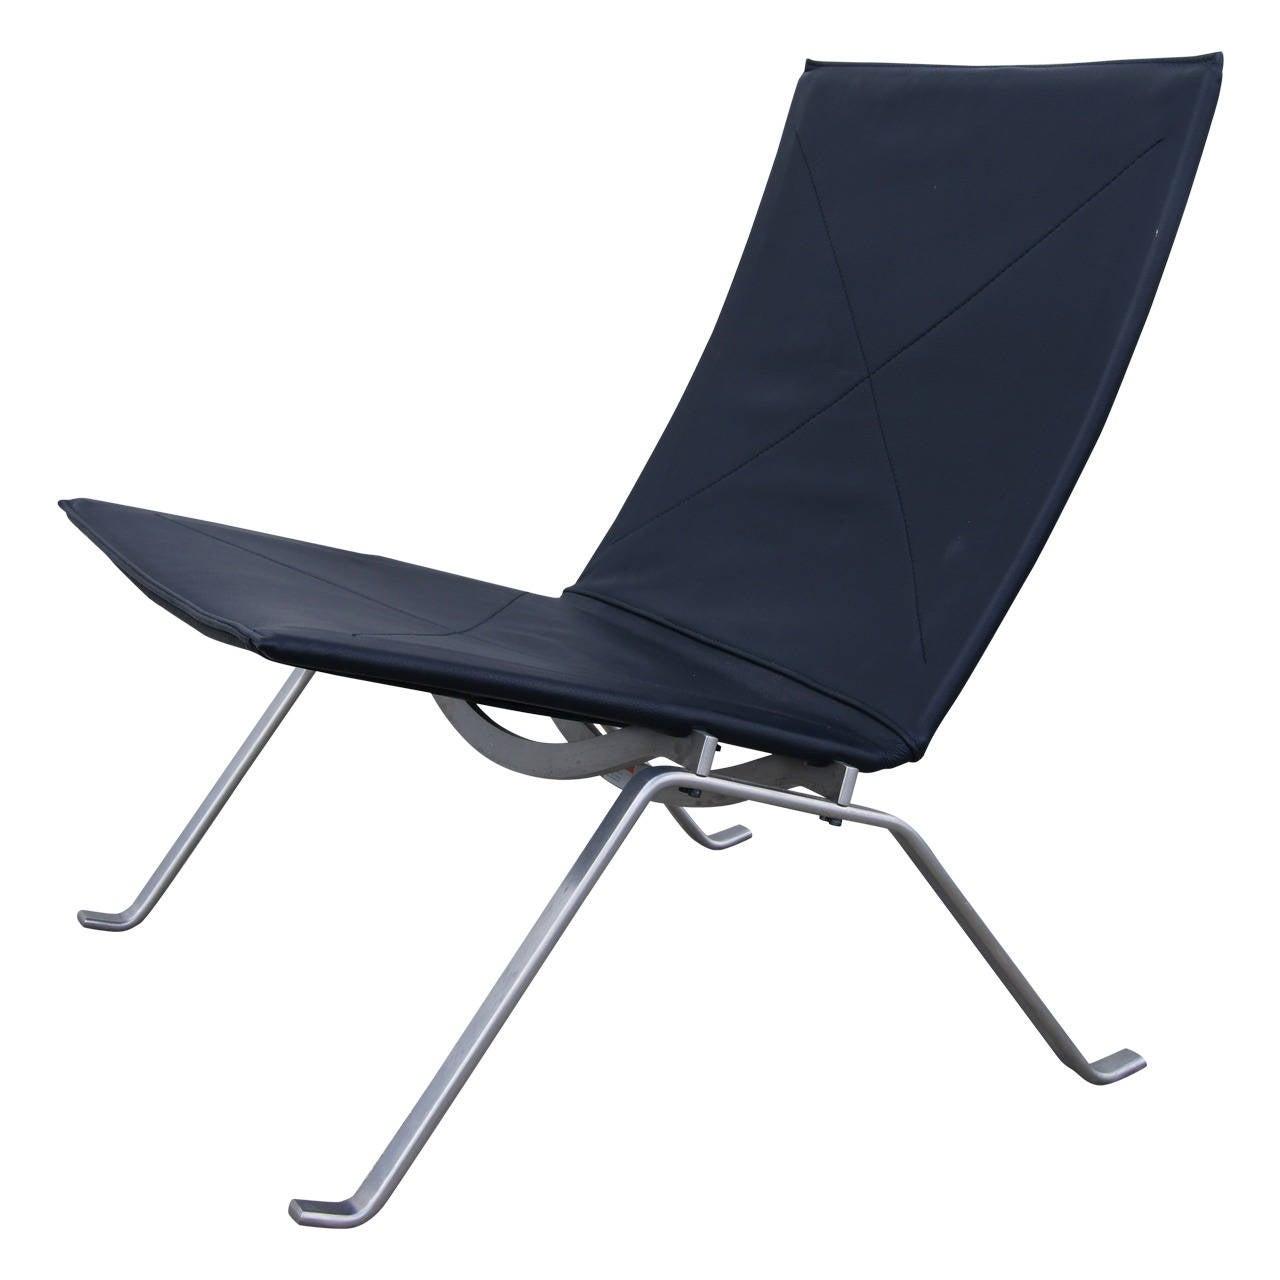 PK22 Lounge Chair by Poul Kjaerholm for Fritz Hansen at